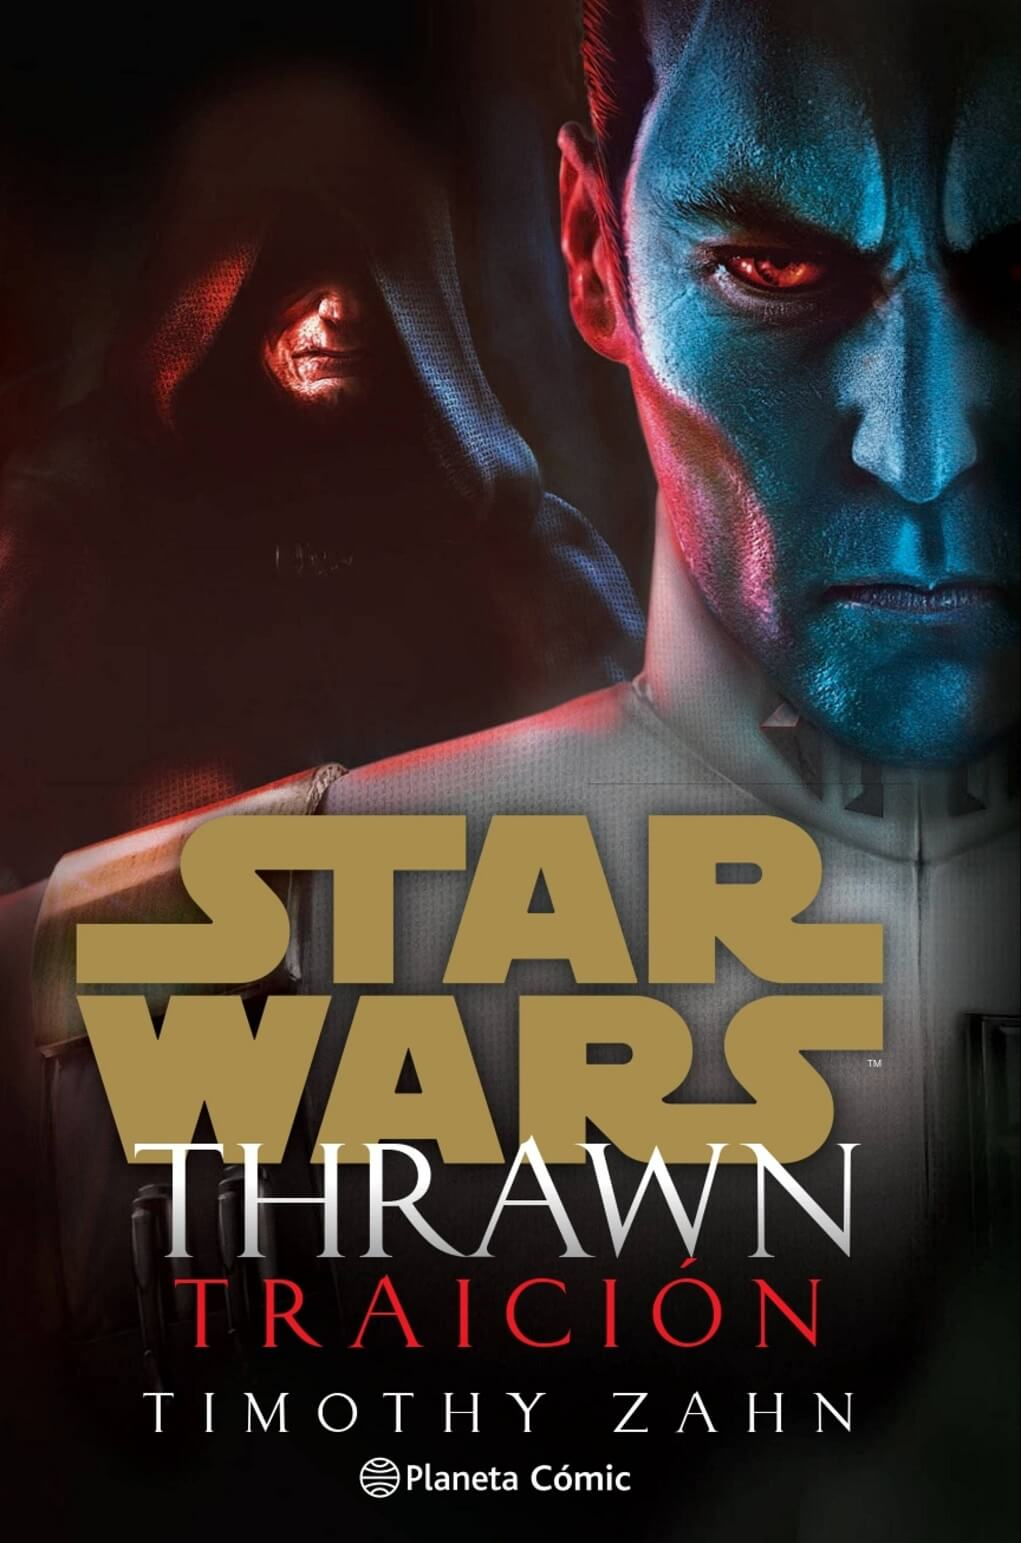 Reseña Star Wars Thrawn Traición